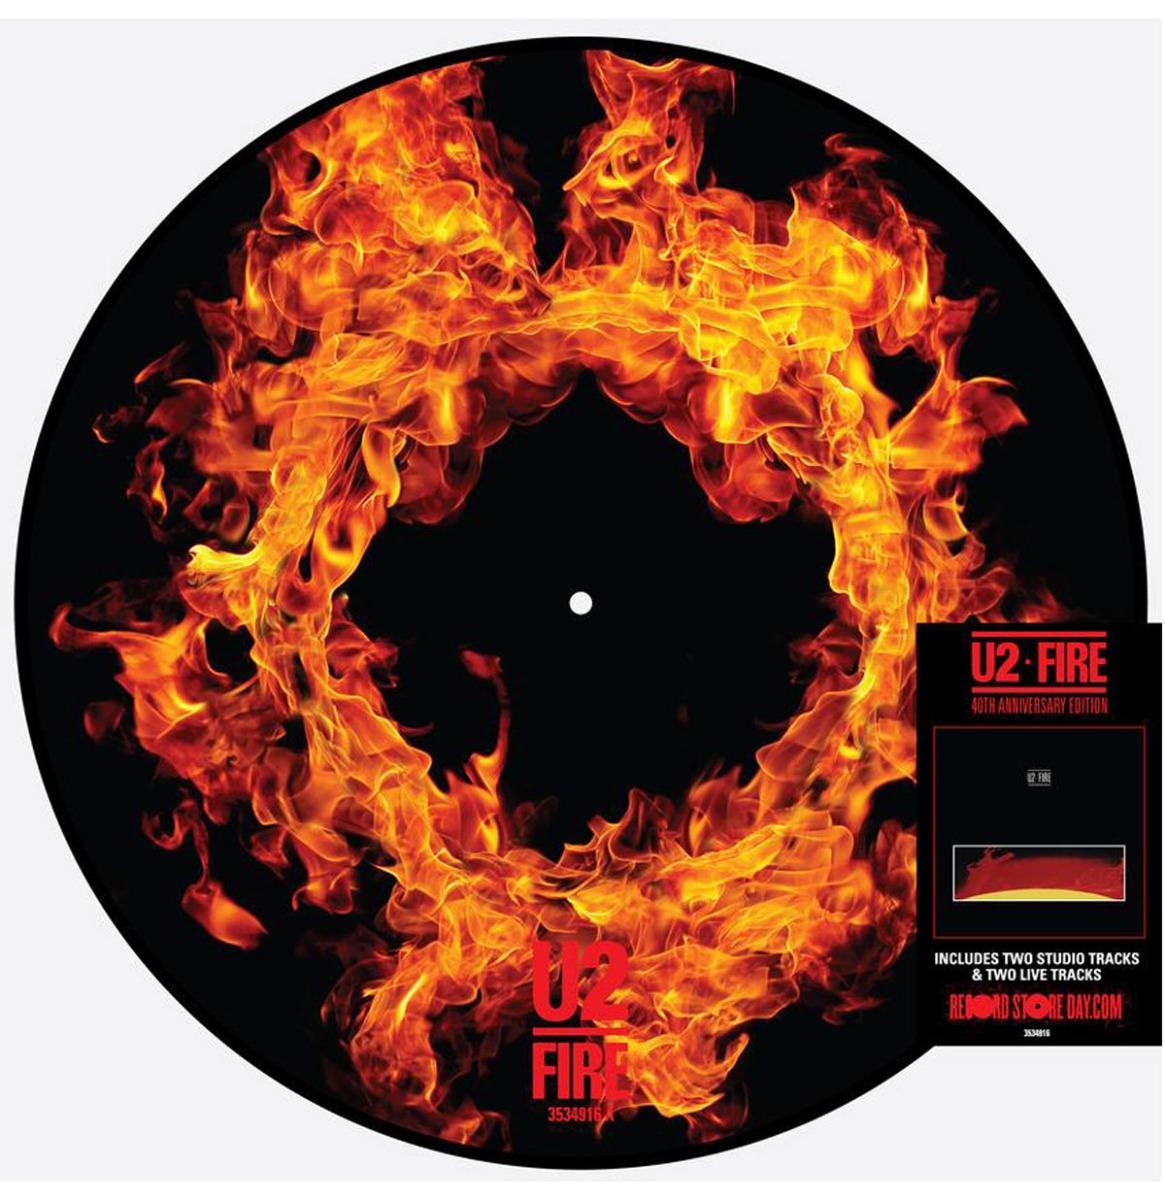 U2 - Fire 40th Anniversary Picture Disc LP (Record Store Day 2021 Vinyl)